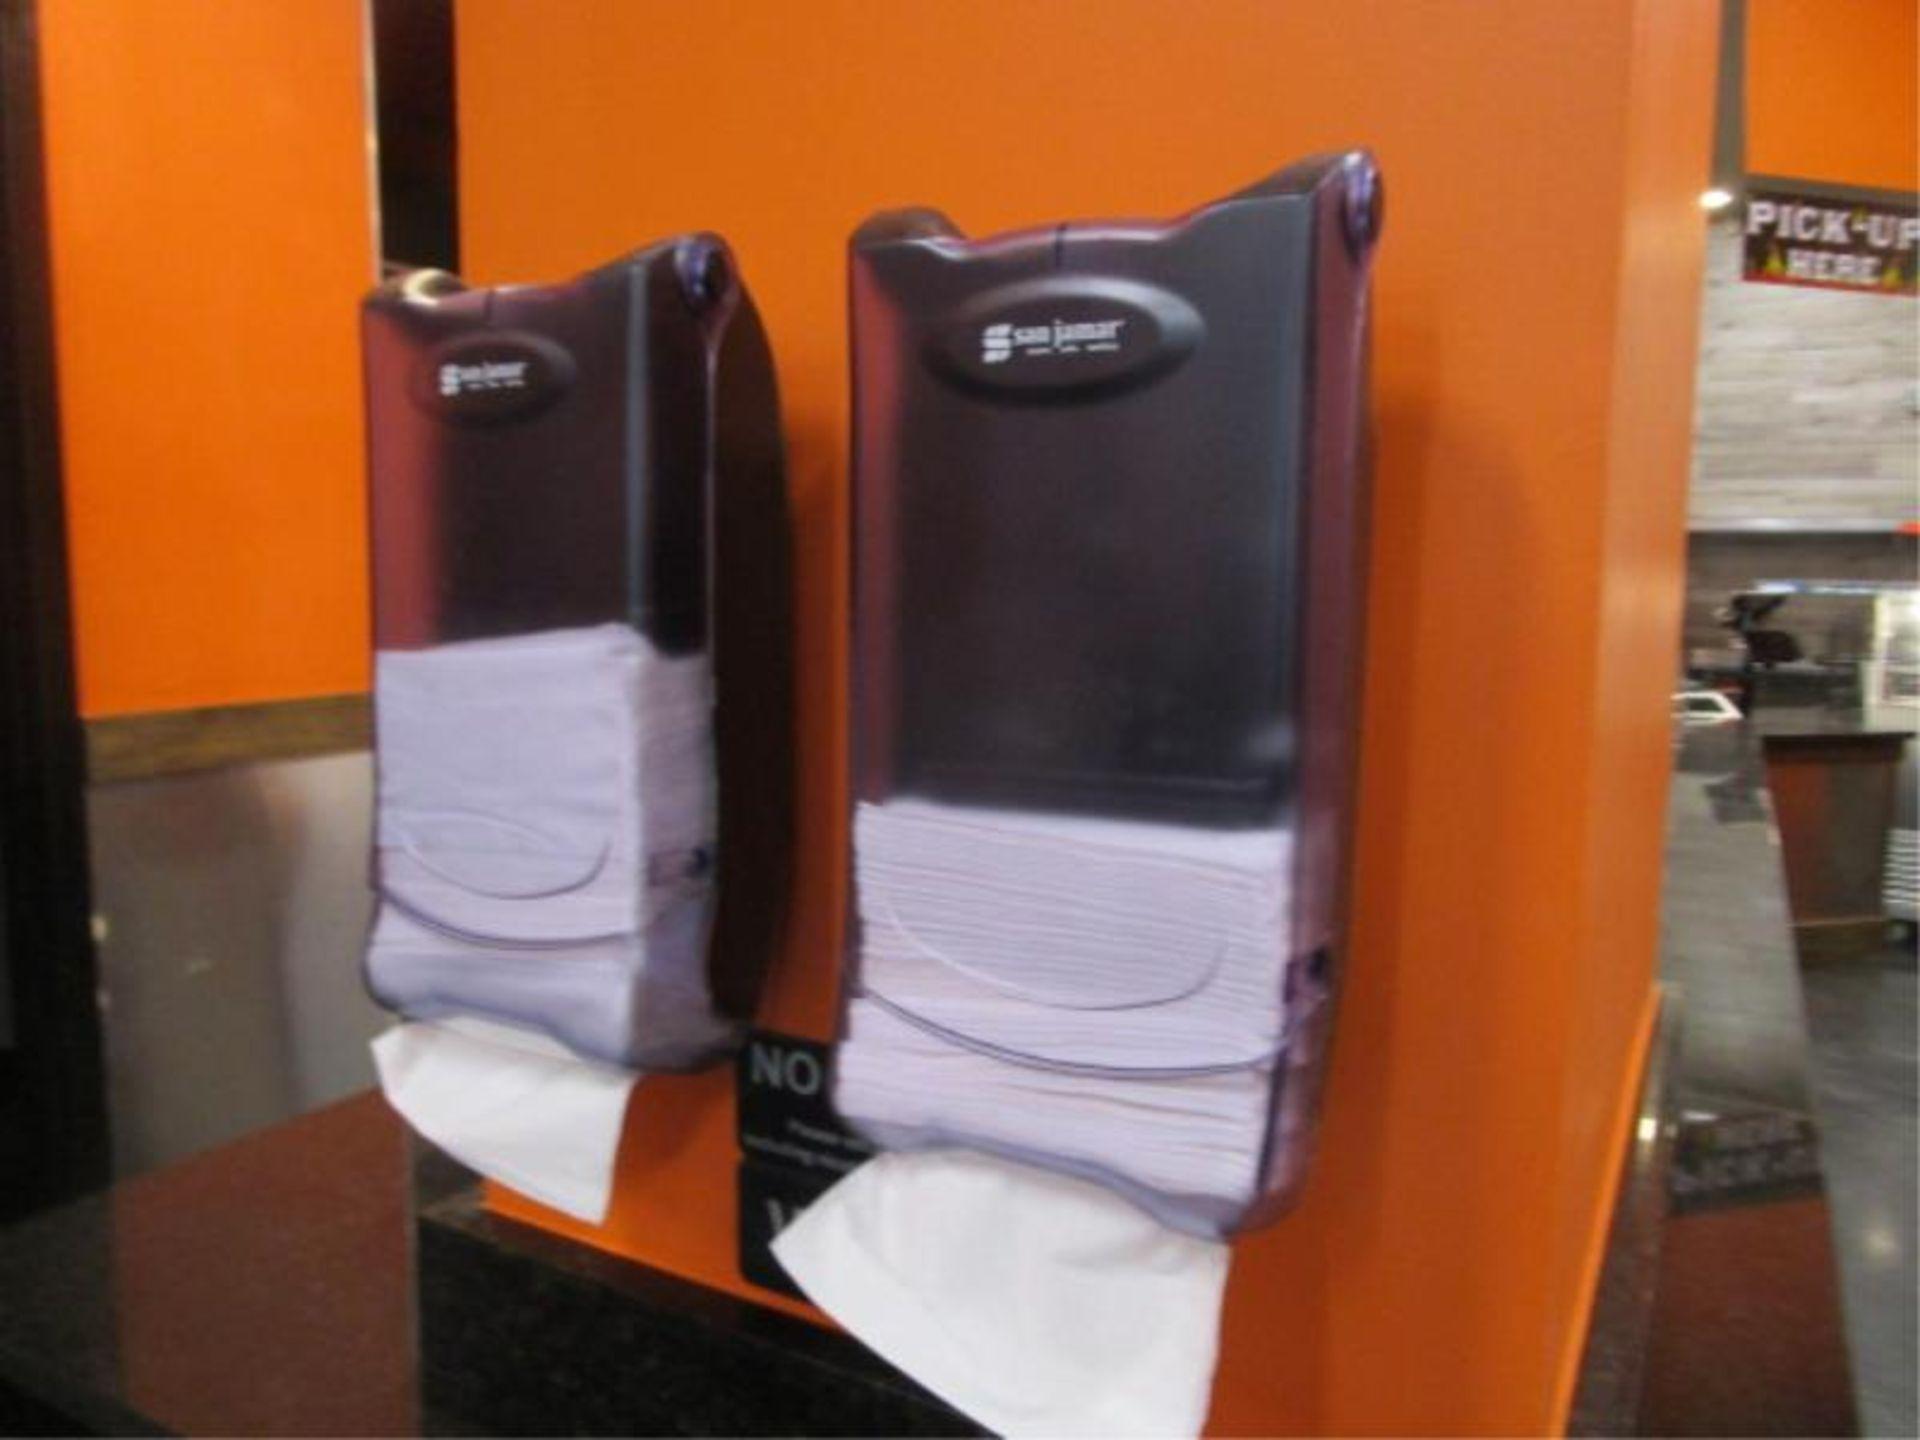 Lot 11 - (3) Dixe Wall Mounted Utensil Dispensers & (2) Napkin Dispenser